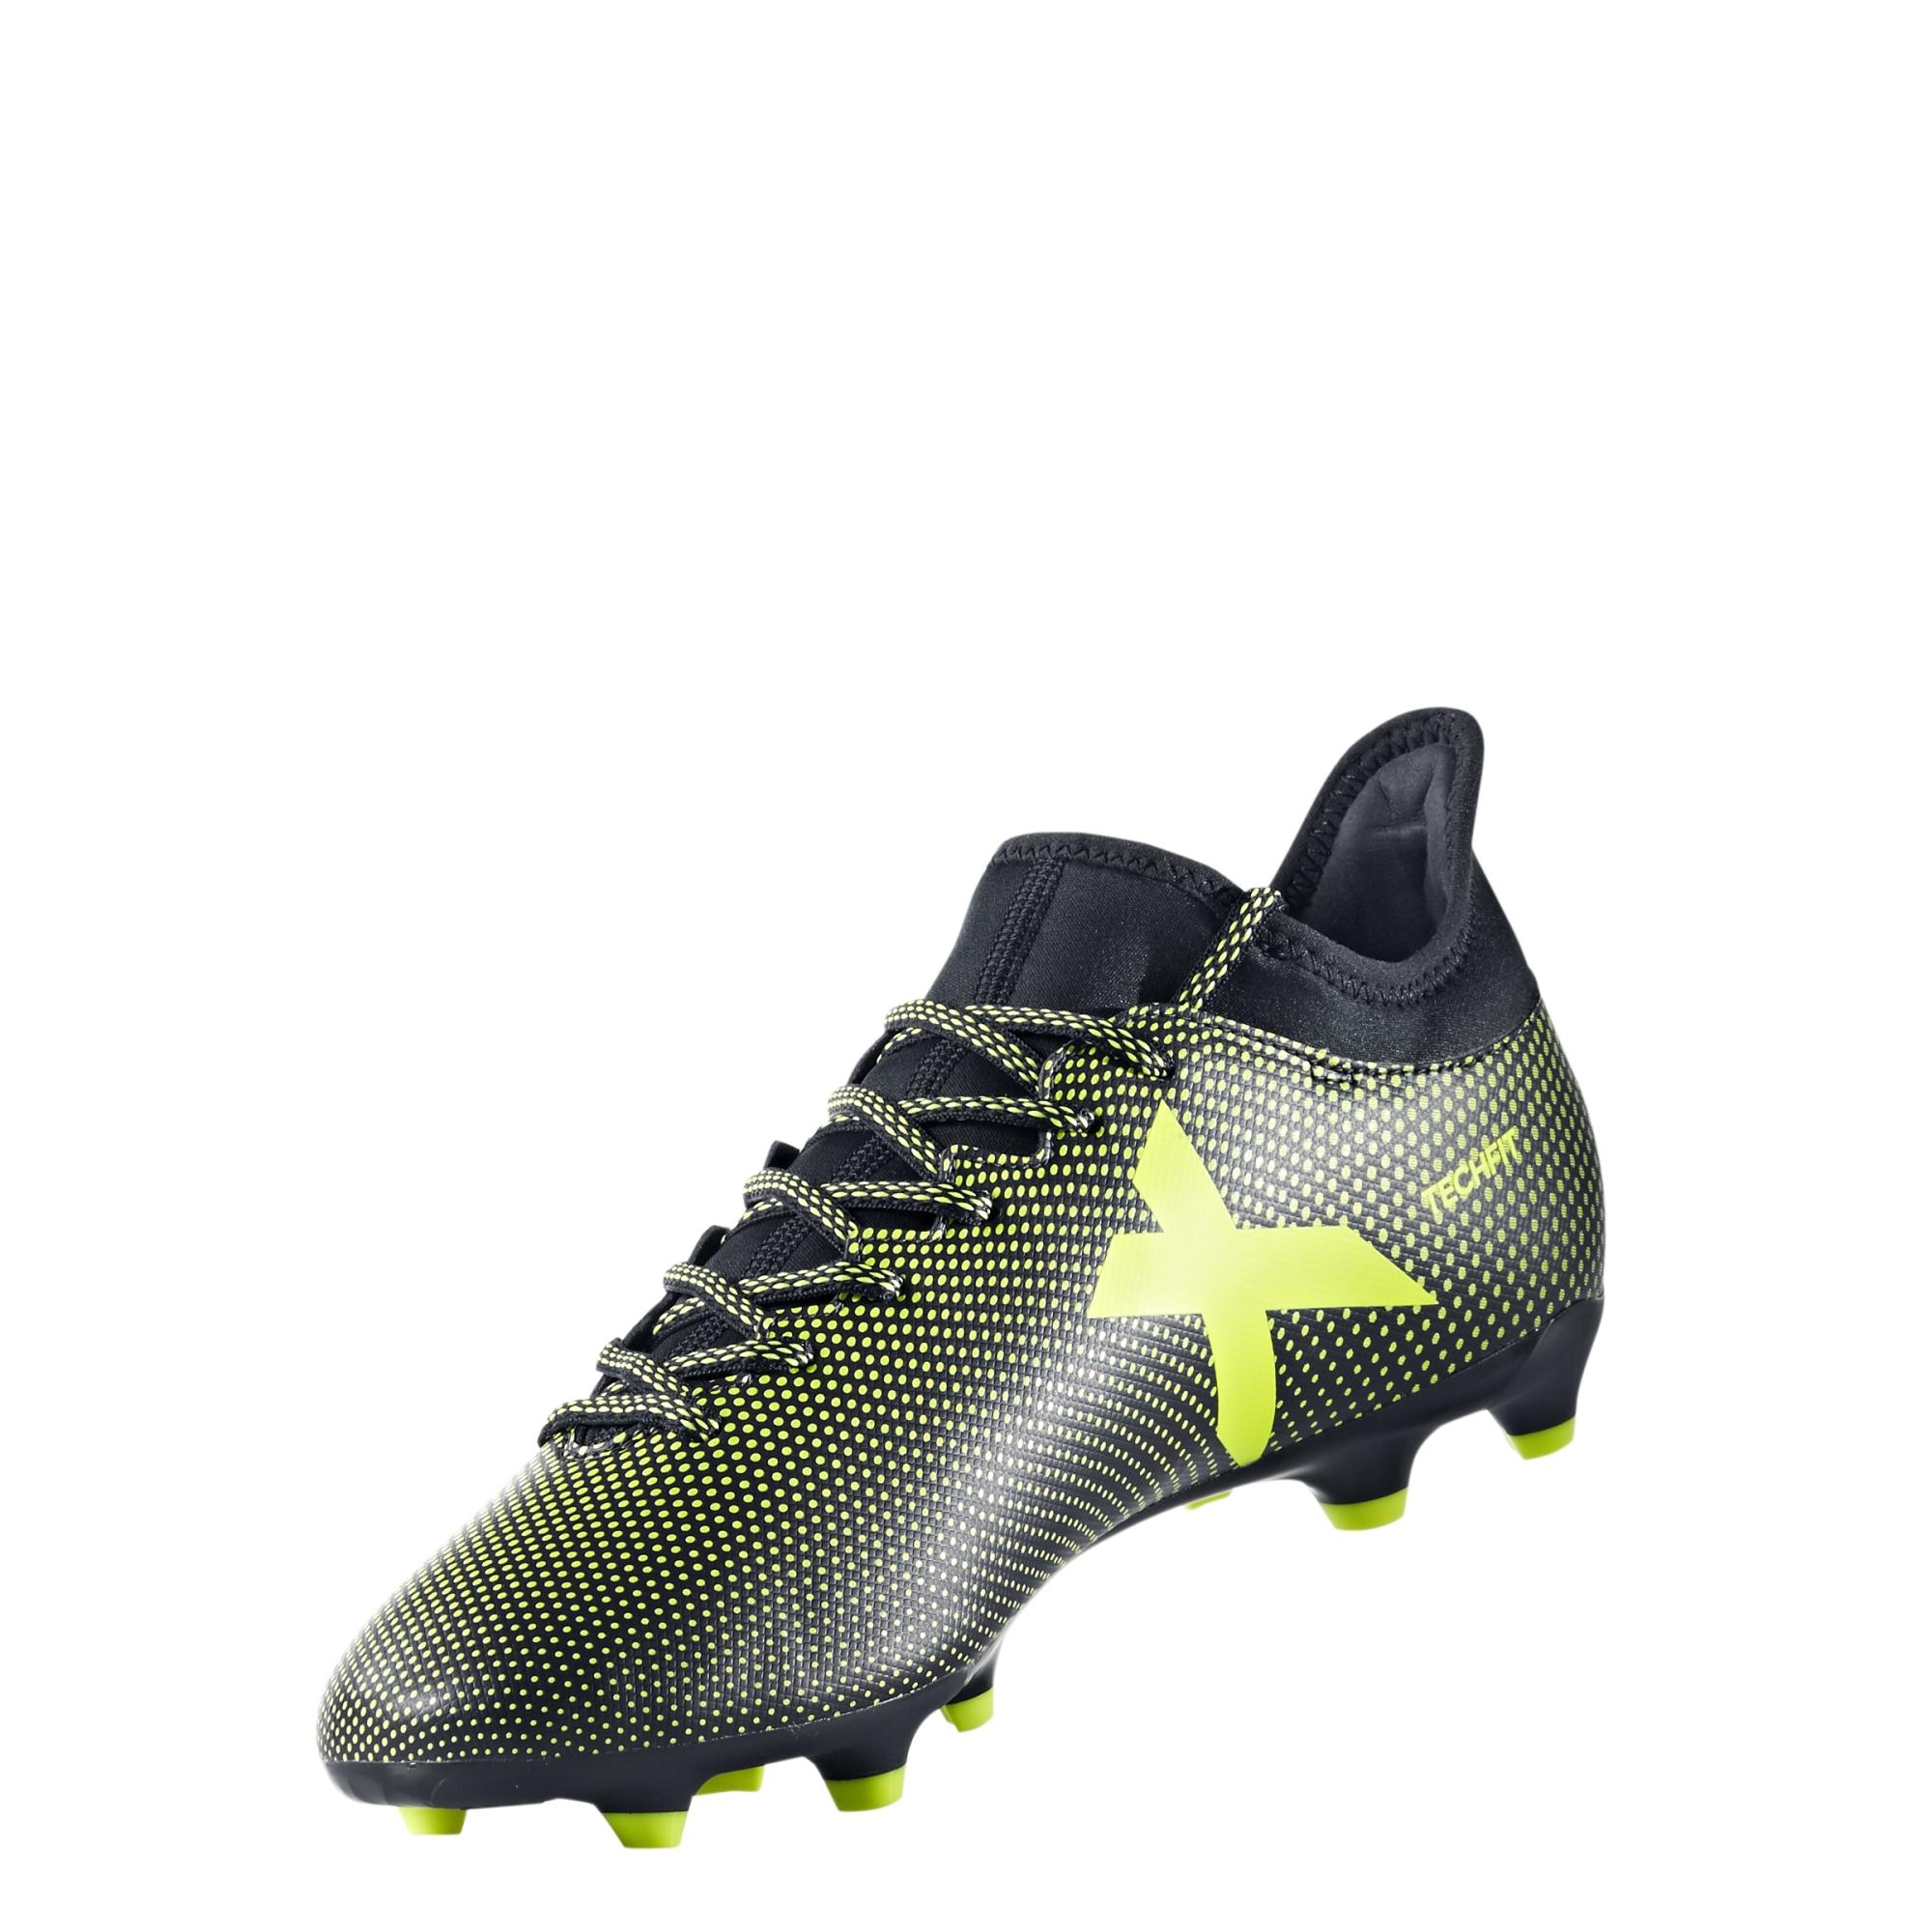 Schuhe adidas Performance X 17.3 FG Fußballschuh Nocken